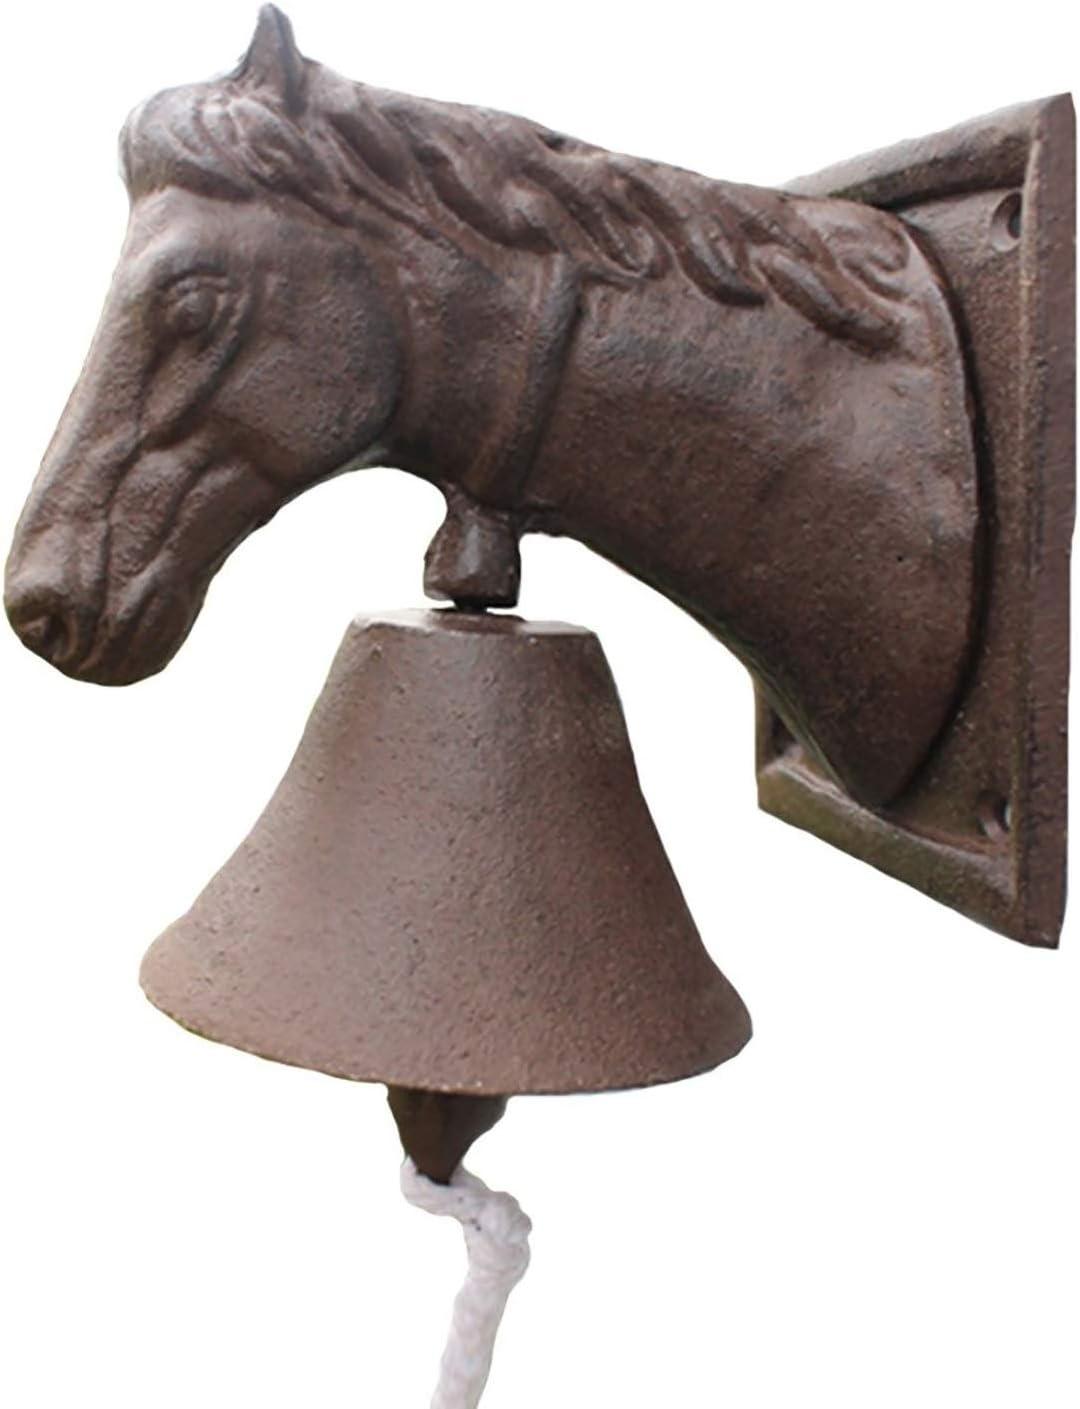 ZZYE Ranking TOP15 Dinner Bell New item Cast Iron Door Horse Head Ornate Doorbell